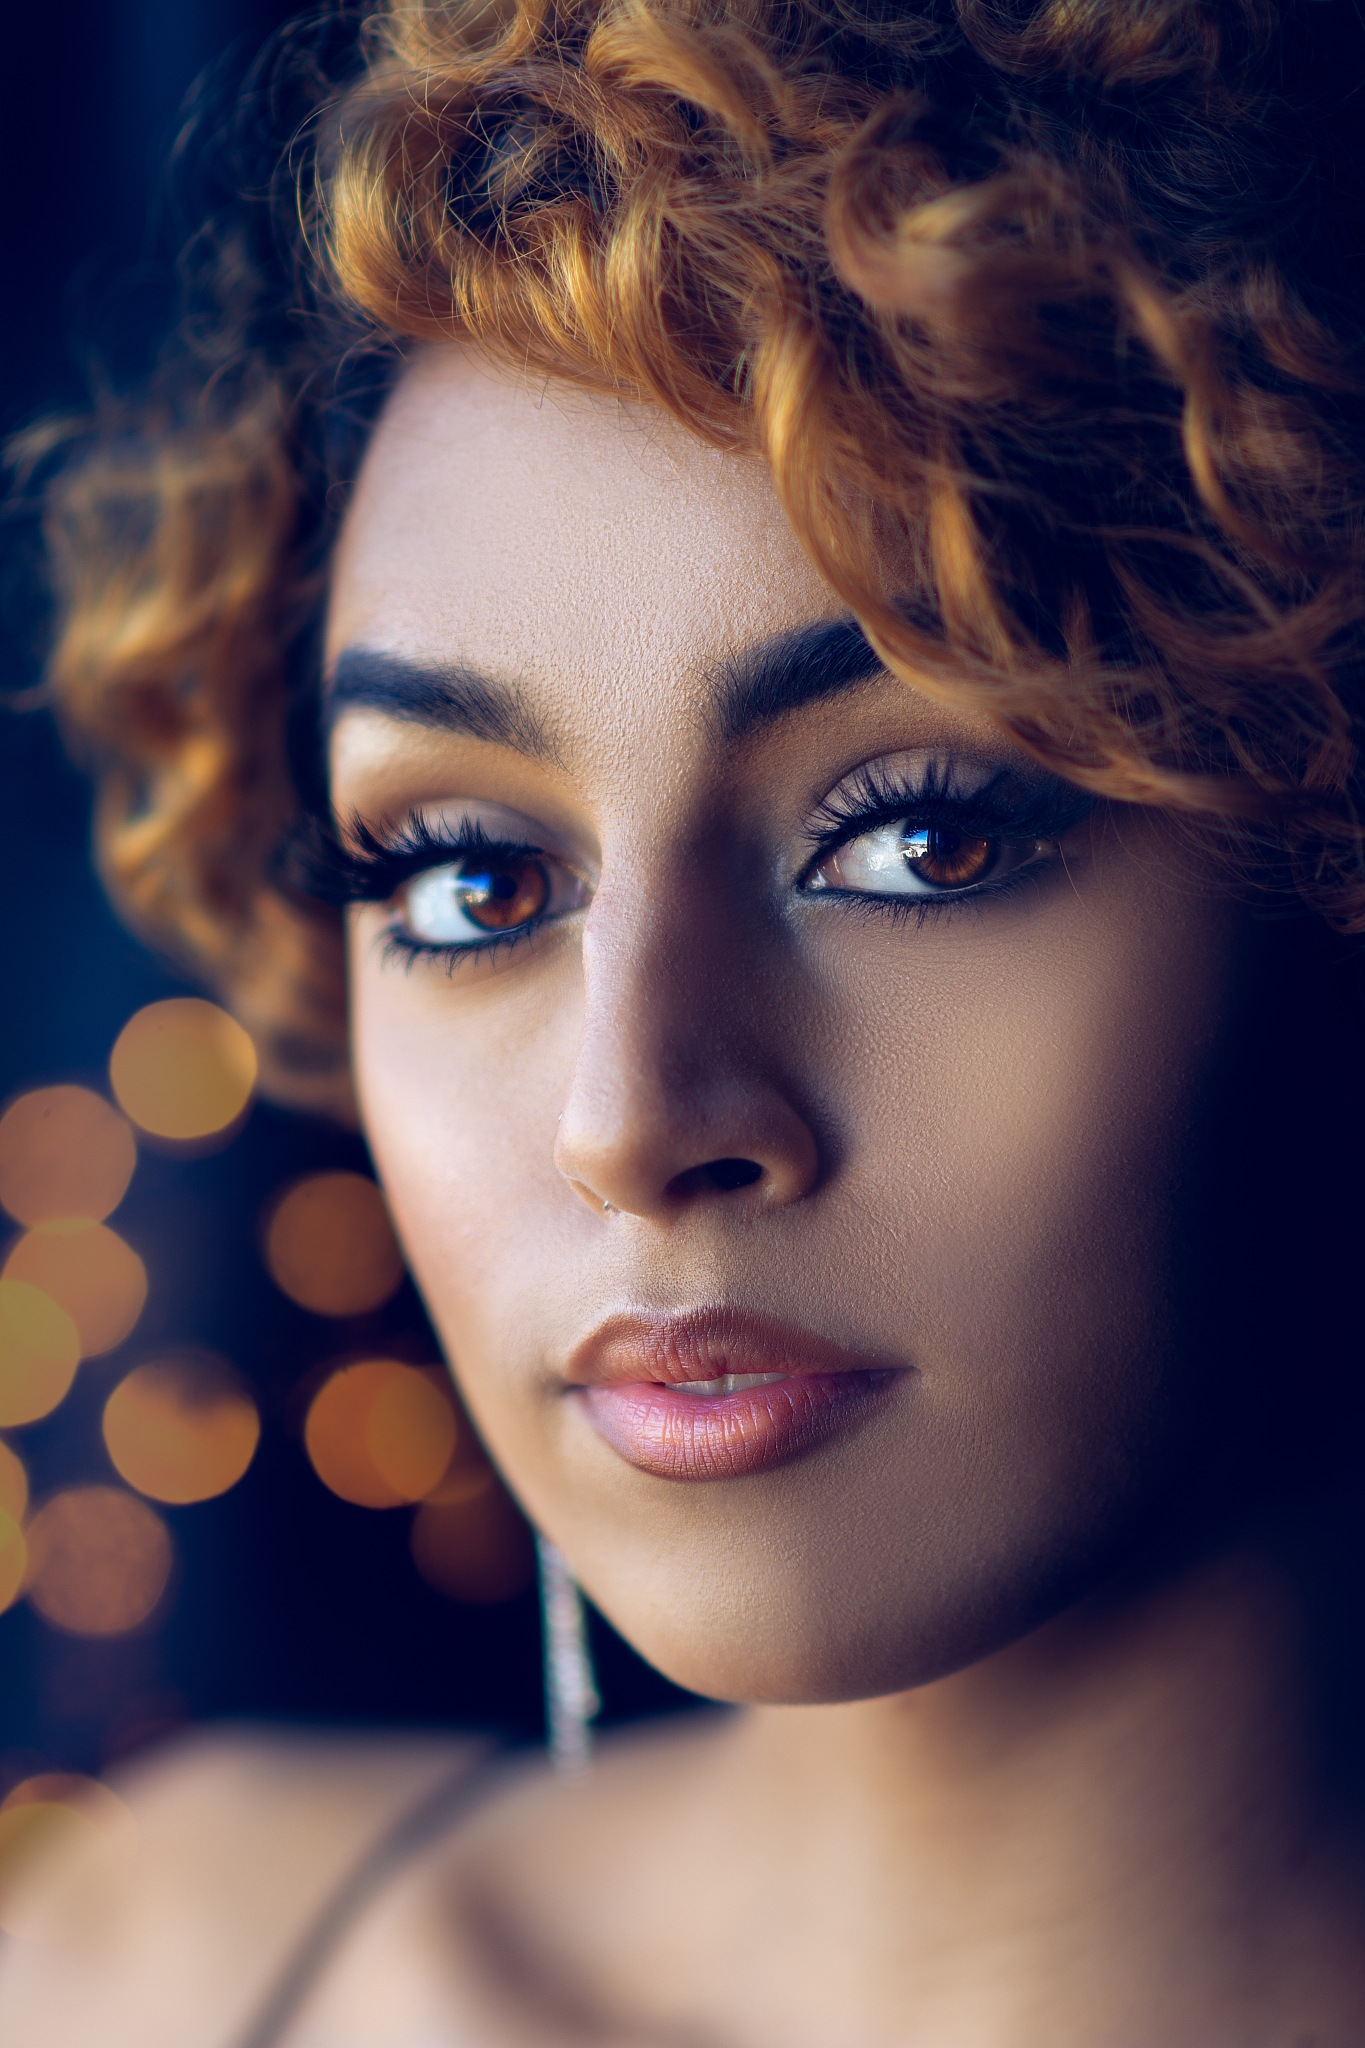 Photo in Portrait #portrait #carina mckee photography #nikon #nikkor #glamour #face #girl #woman #eyelashes #eyes